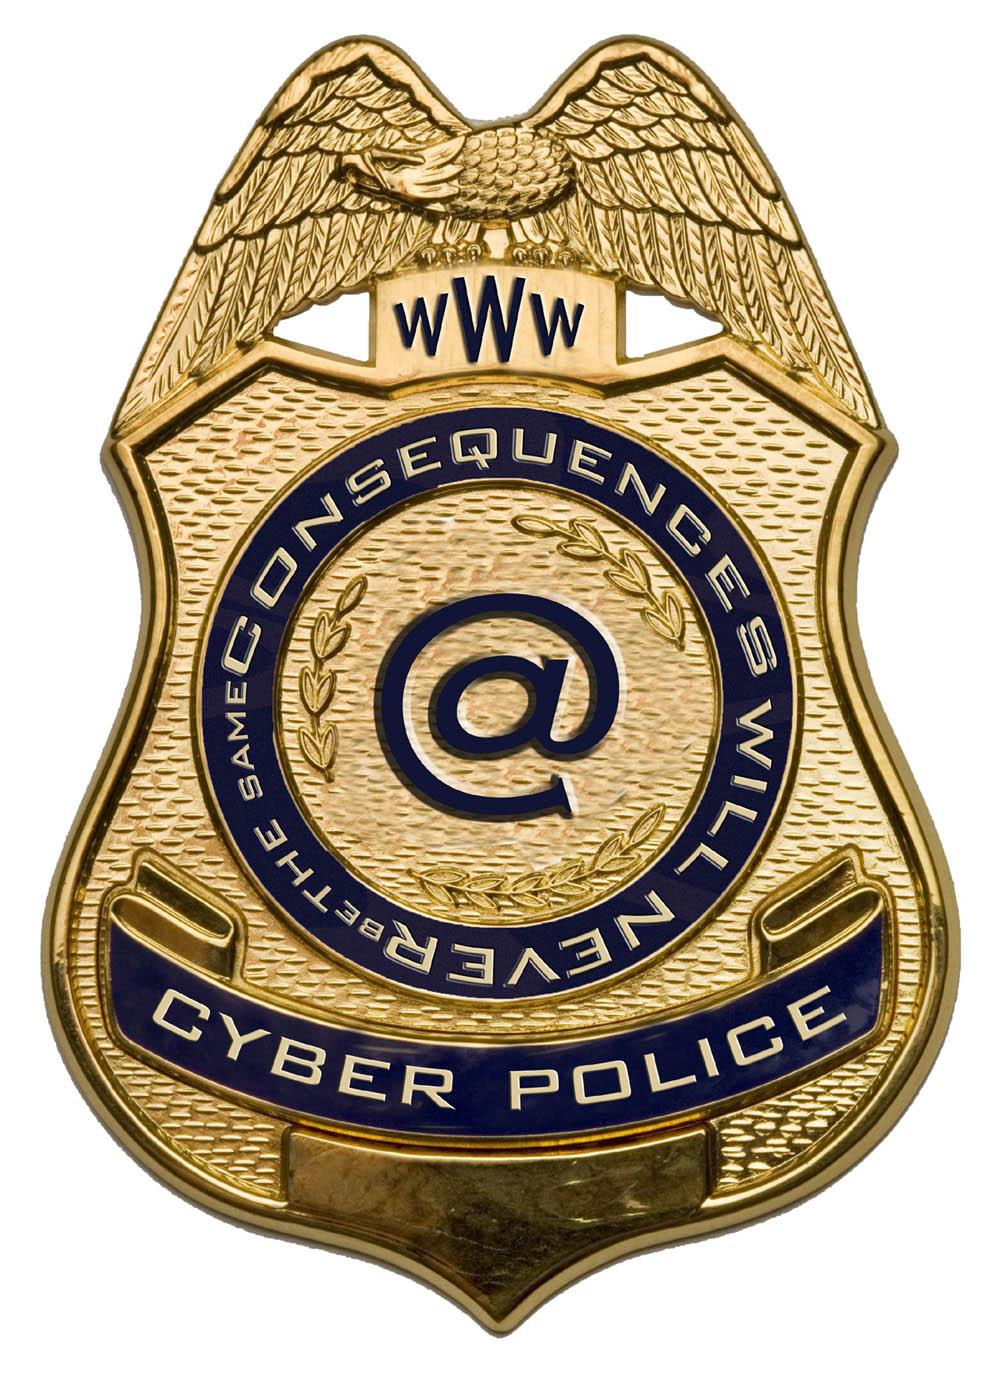 2-police-logo-design